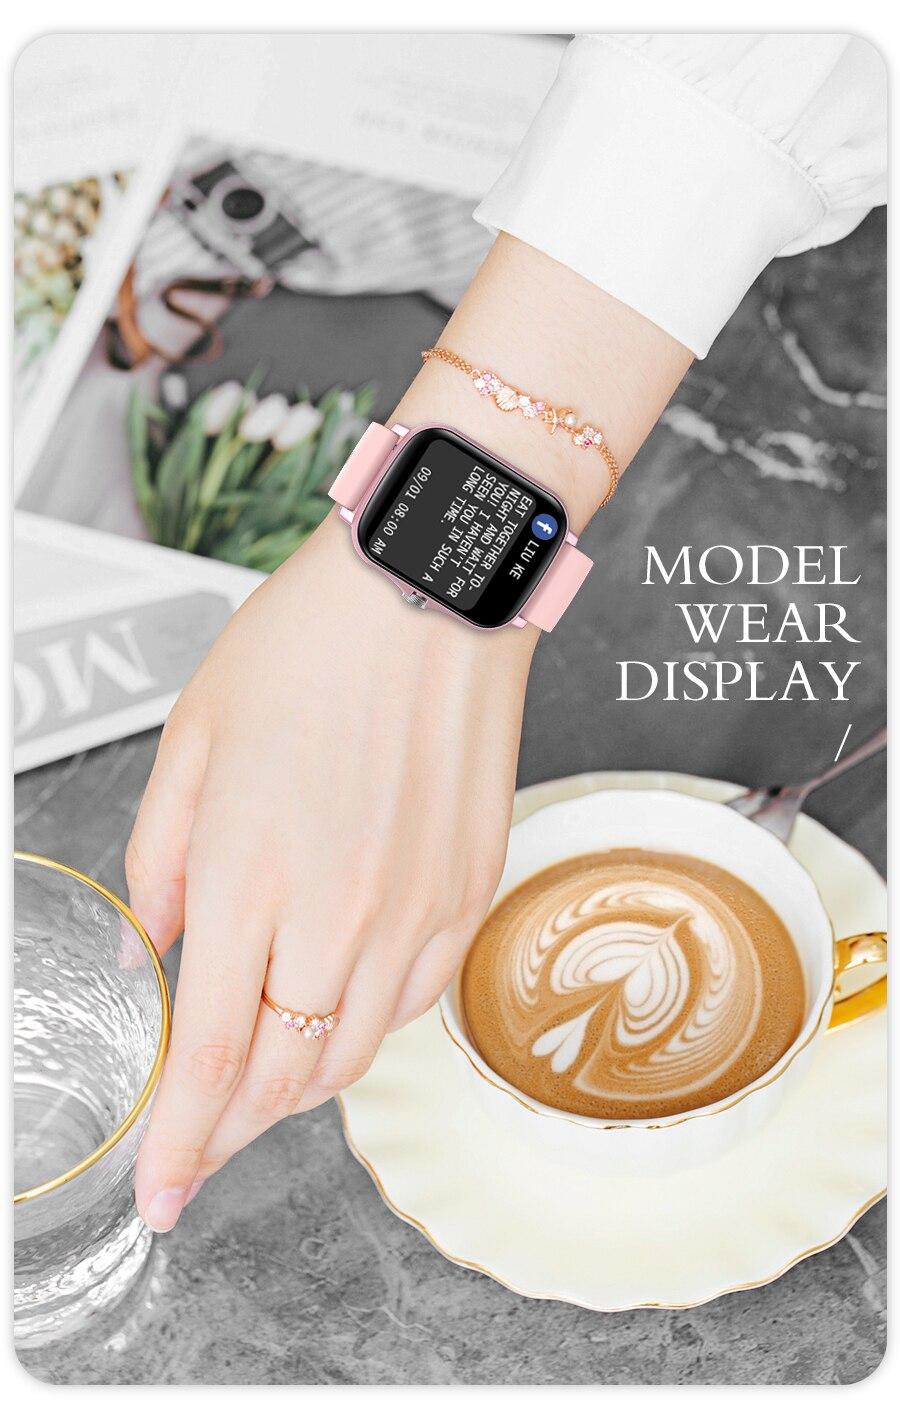 H8581eb78aed64b08a2edcaa11da37924r Full Touch Y20 Sport Smart Watch Men Women IP68 custom dial Heart Rate Fitness Tracker Smartwatch wristwatch GTS 2 P8 plus